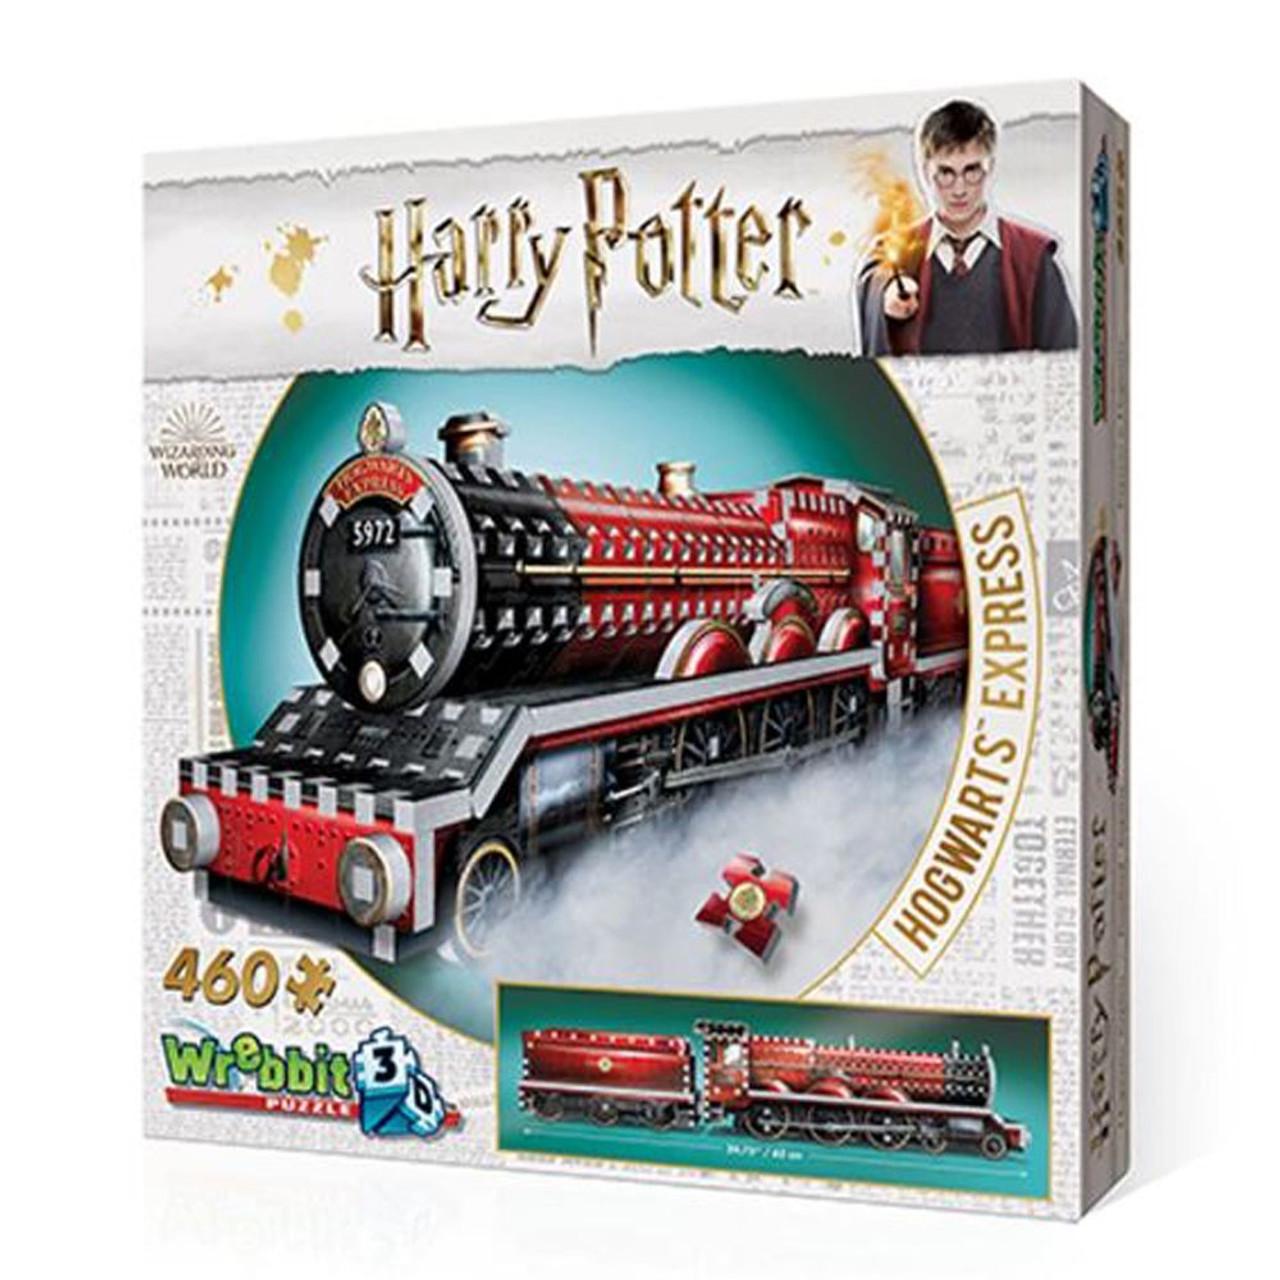 HARRY POTTER HOGWARTS EXPRESS 3D